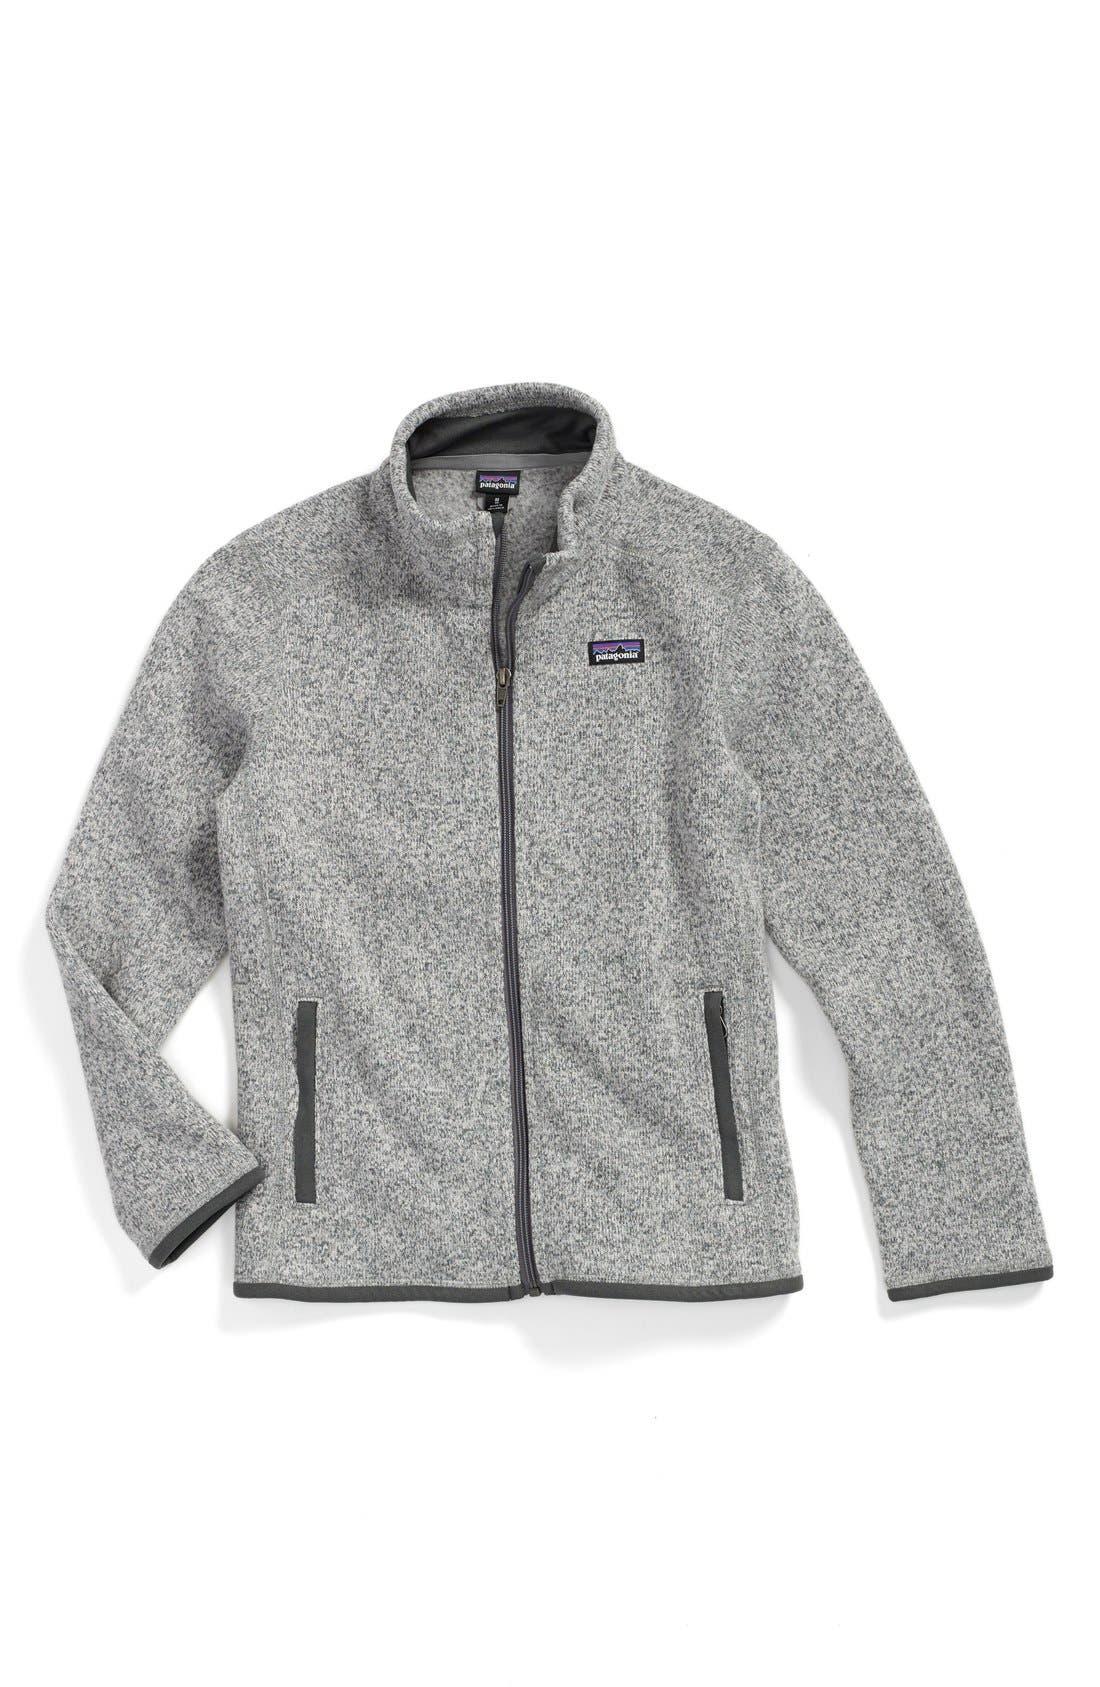 Better Sweater Jacket,                         Main,                         color, STONEWASH GREY